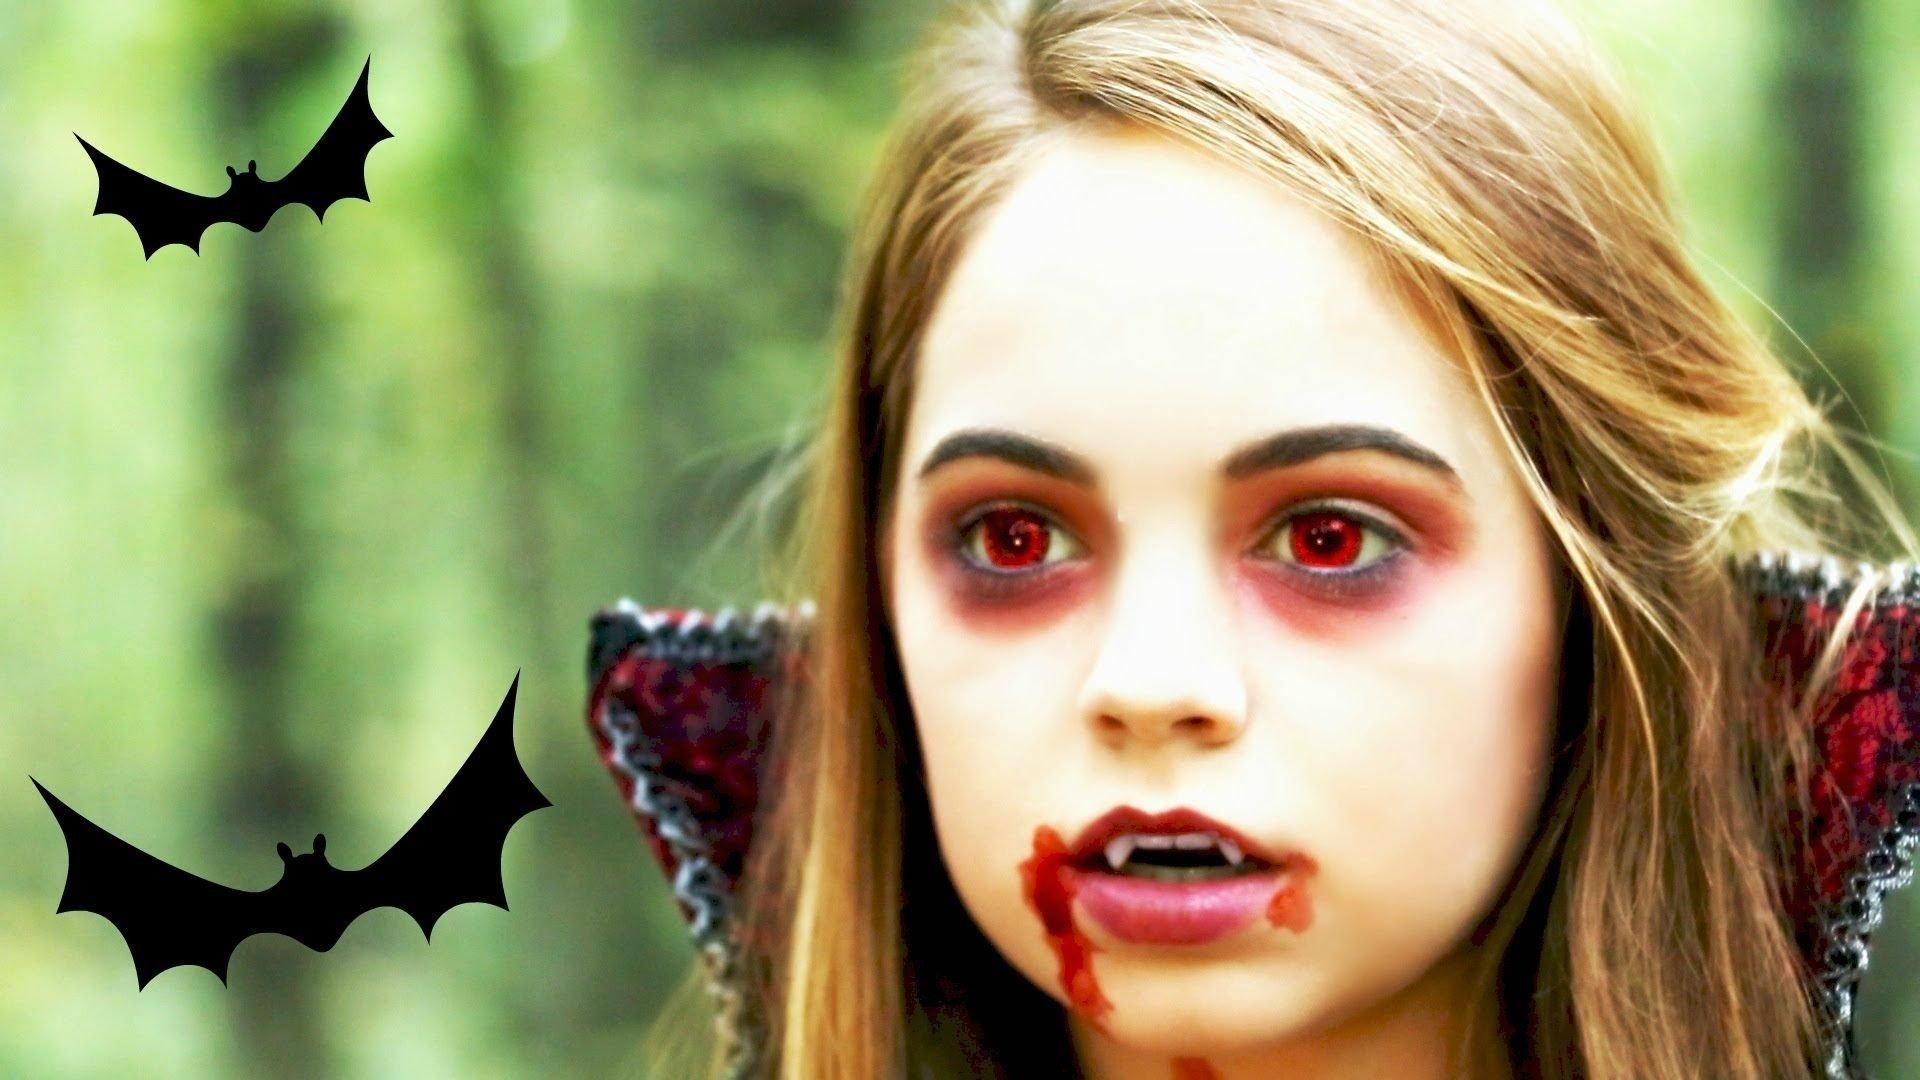 10 Cute Vampire Makeup Ideas For Kids pretty beautiful sexy scary vampire halloween makeup ideas 2020